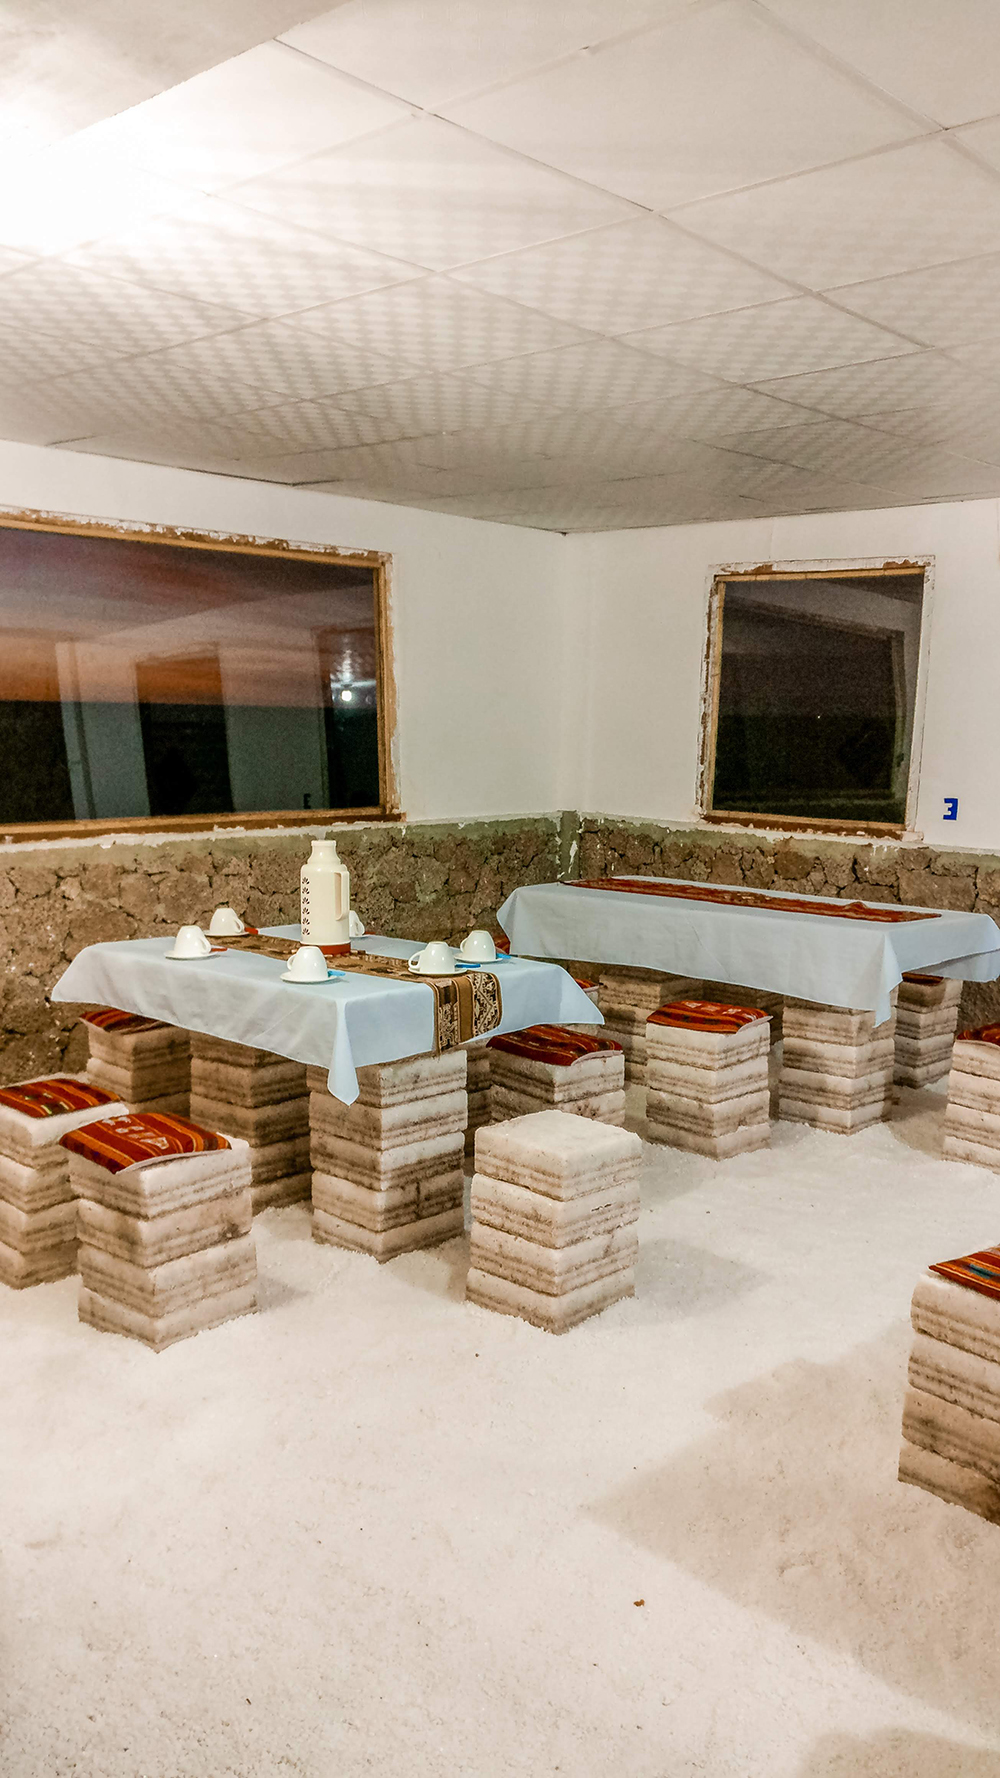 Salty hostel in Colchani - How to pick the best Uyuni Salt Flats tour to Bolivia?   Aliz's Wonderland